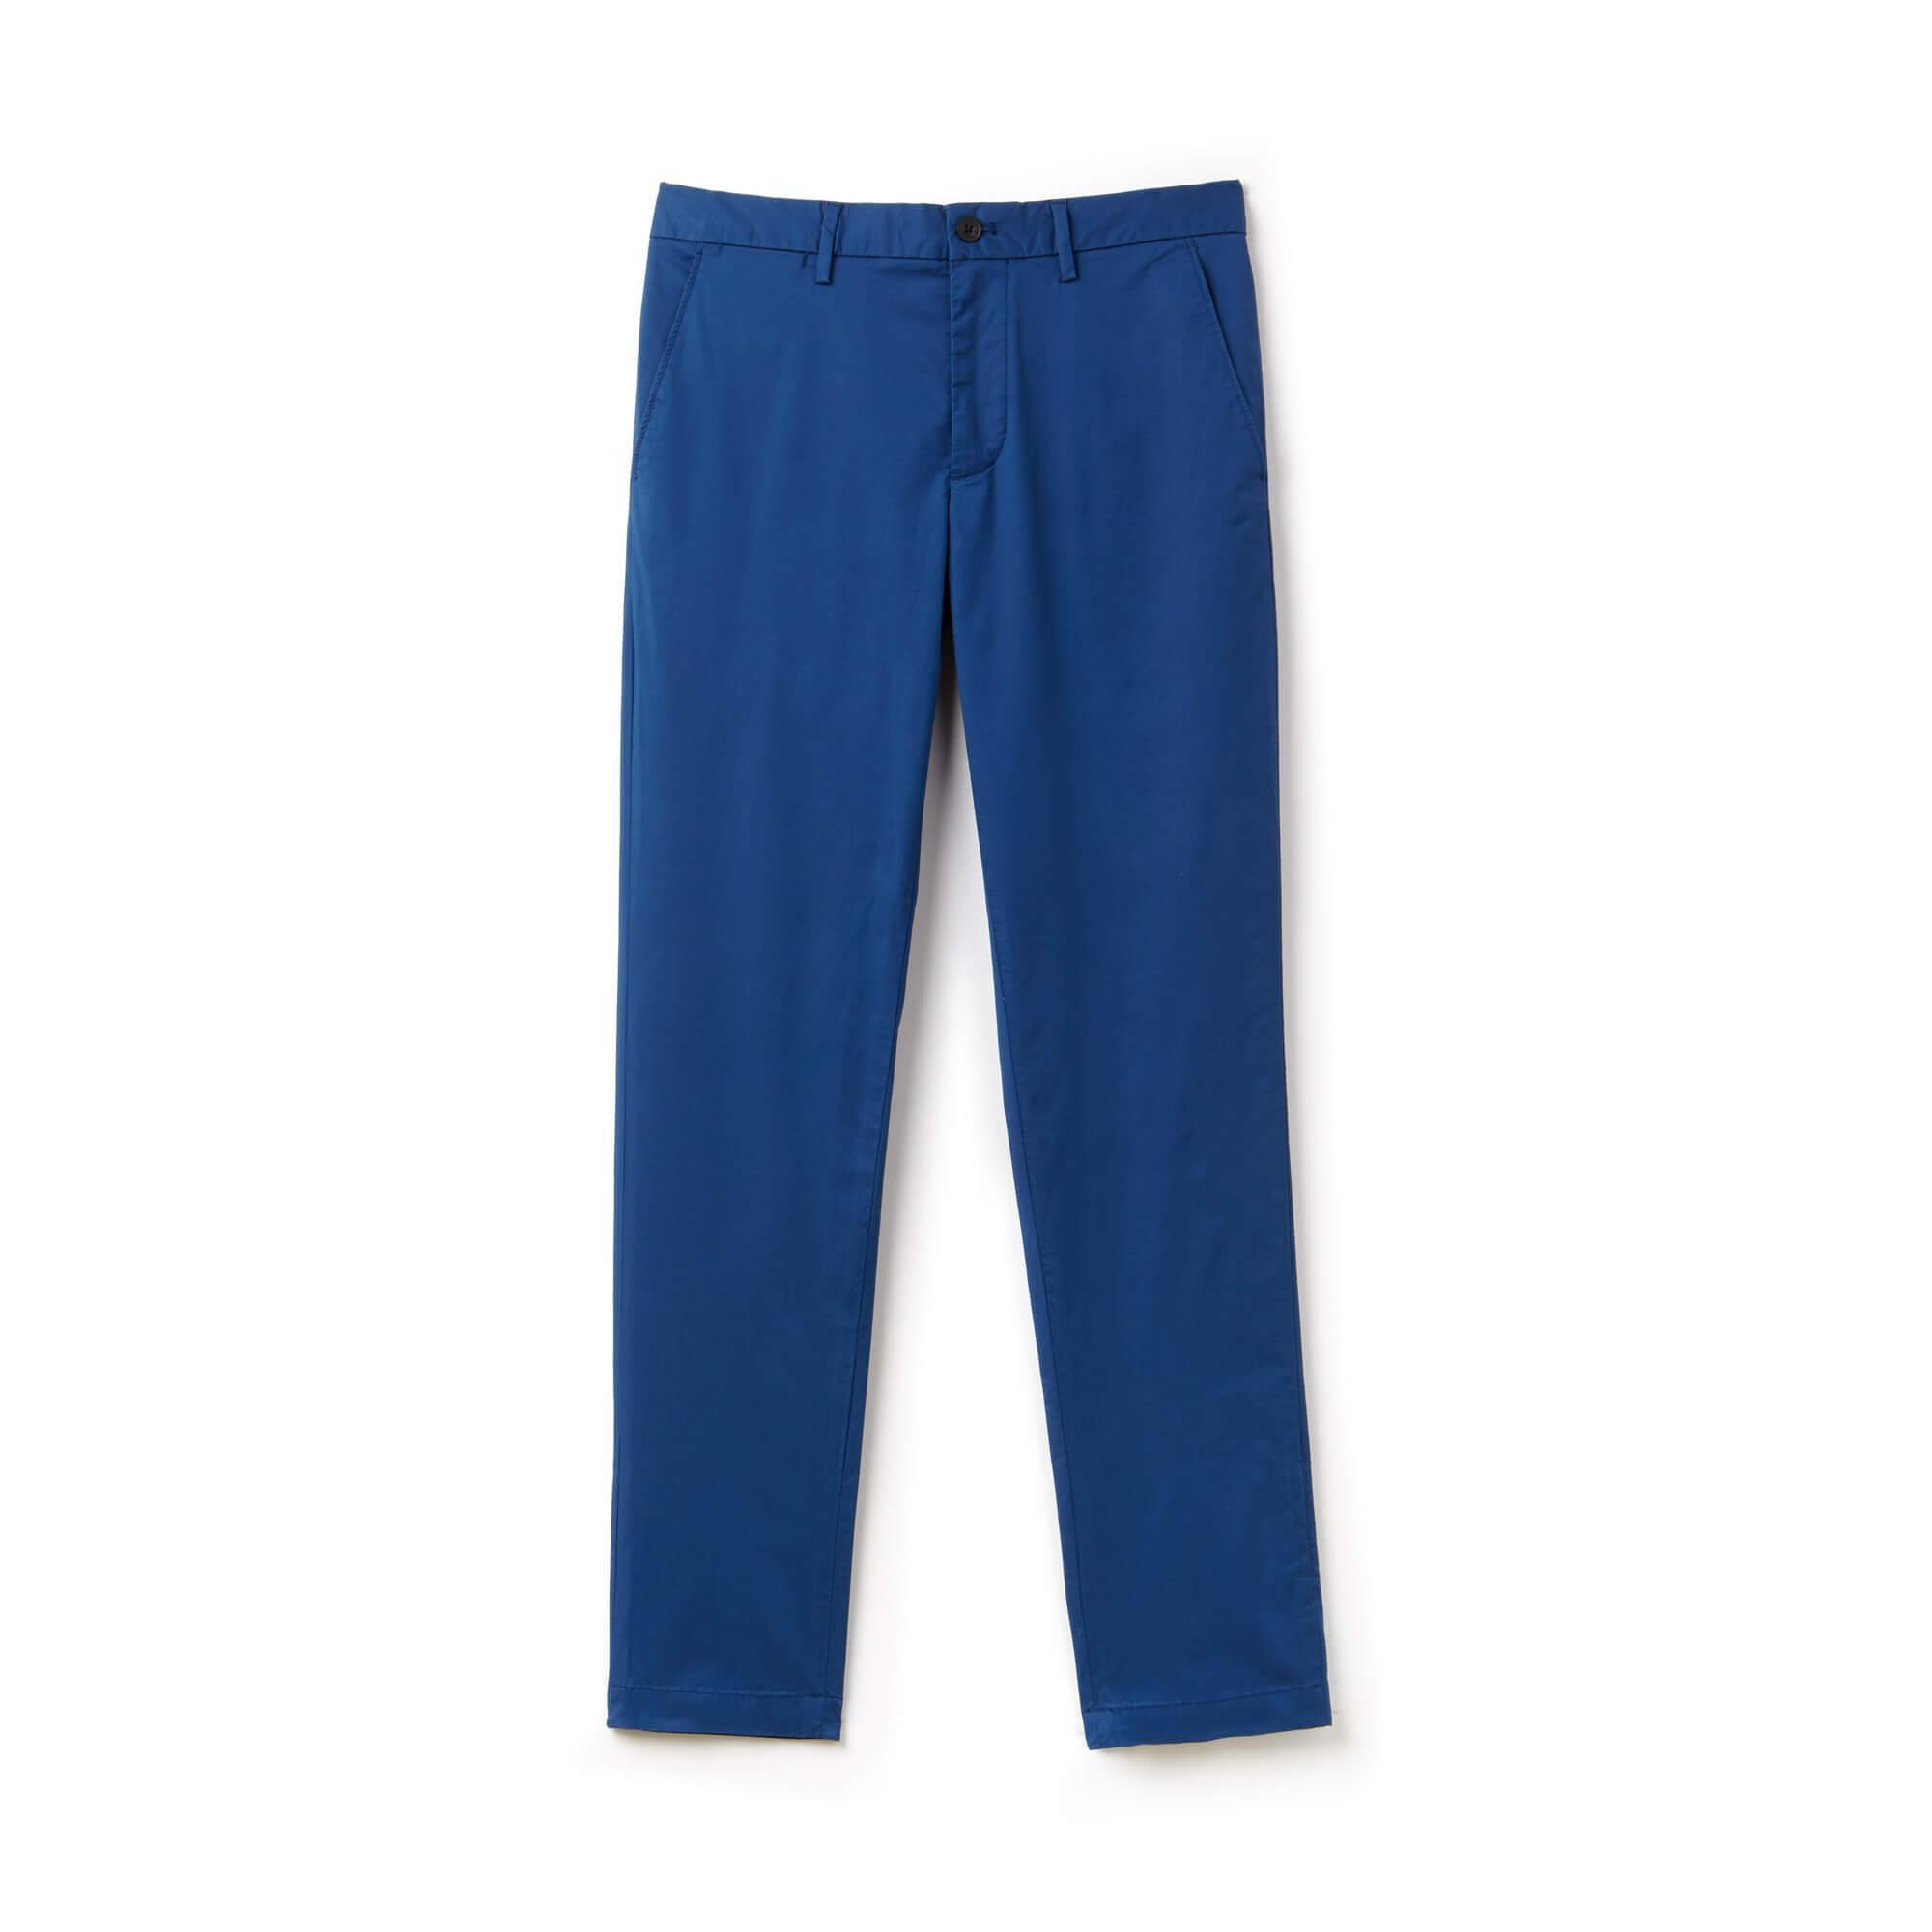 Lacoste Erkek Mavi Chino Pantolon